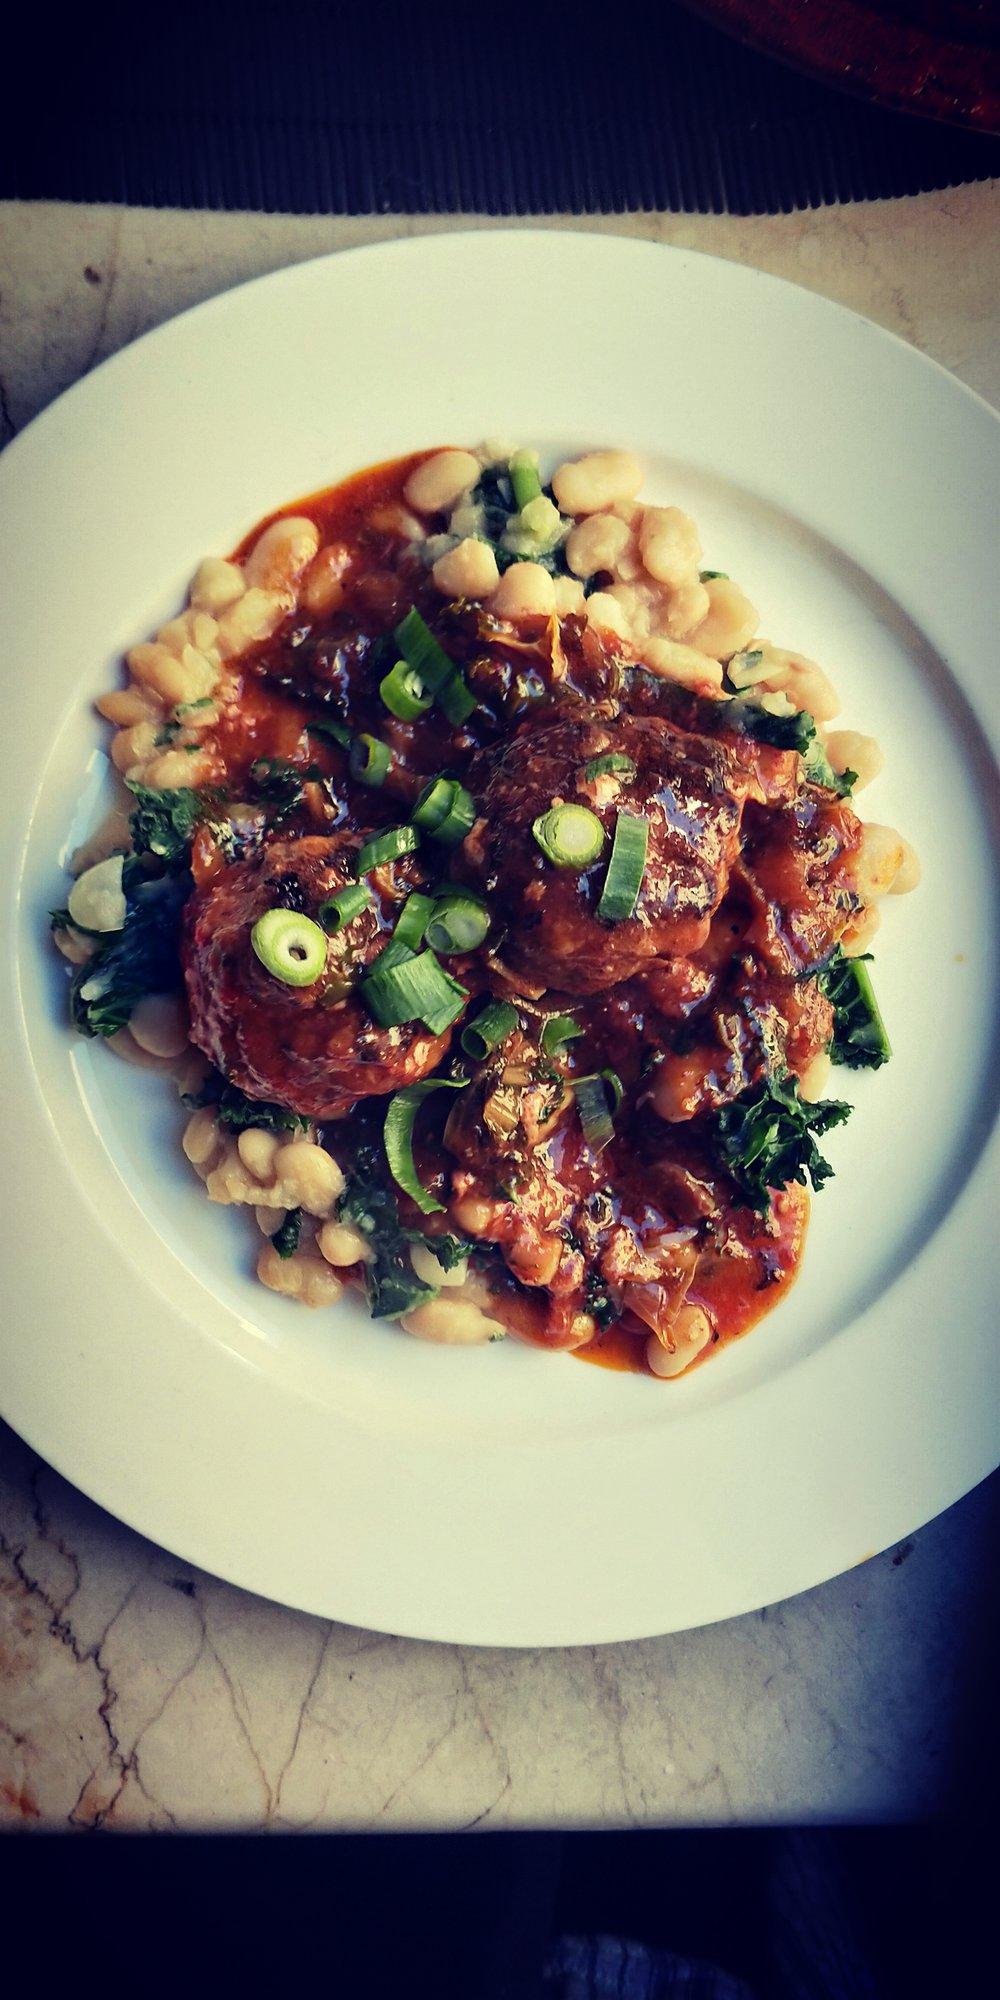 Meat Special Meatballs w/ White Beans, Kale and Smokey Tomato